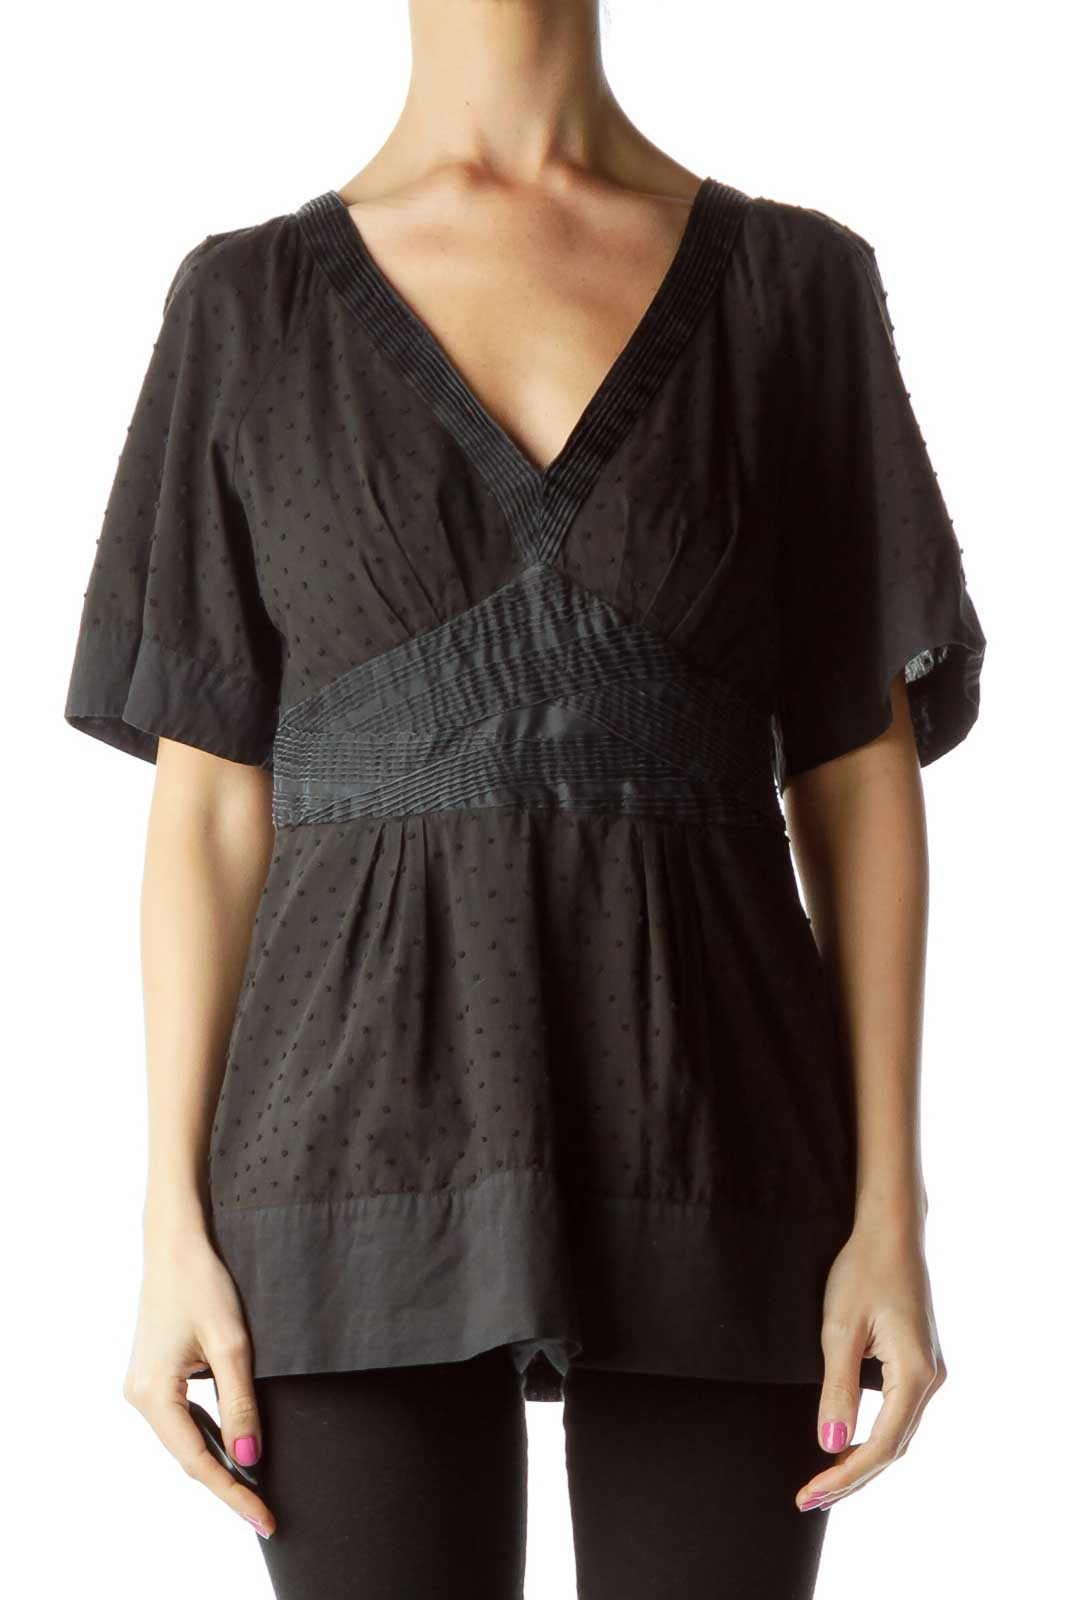 Black V-neck Short Sleeve Polka Dot Blouse Front